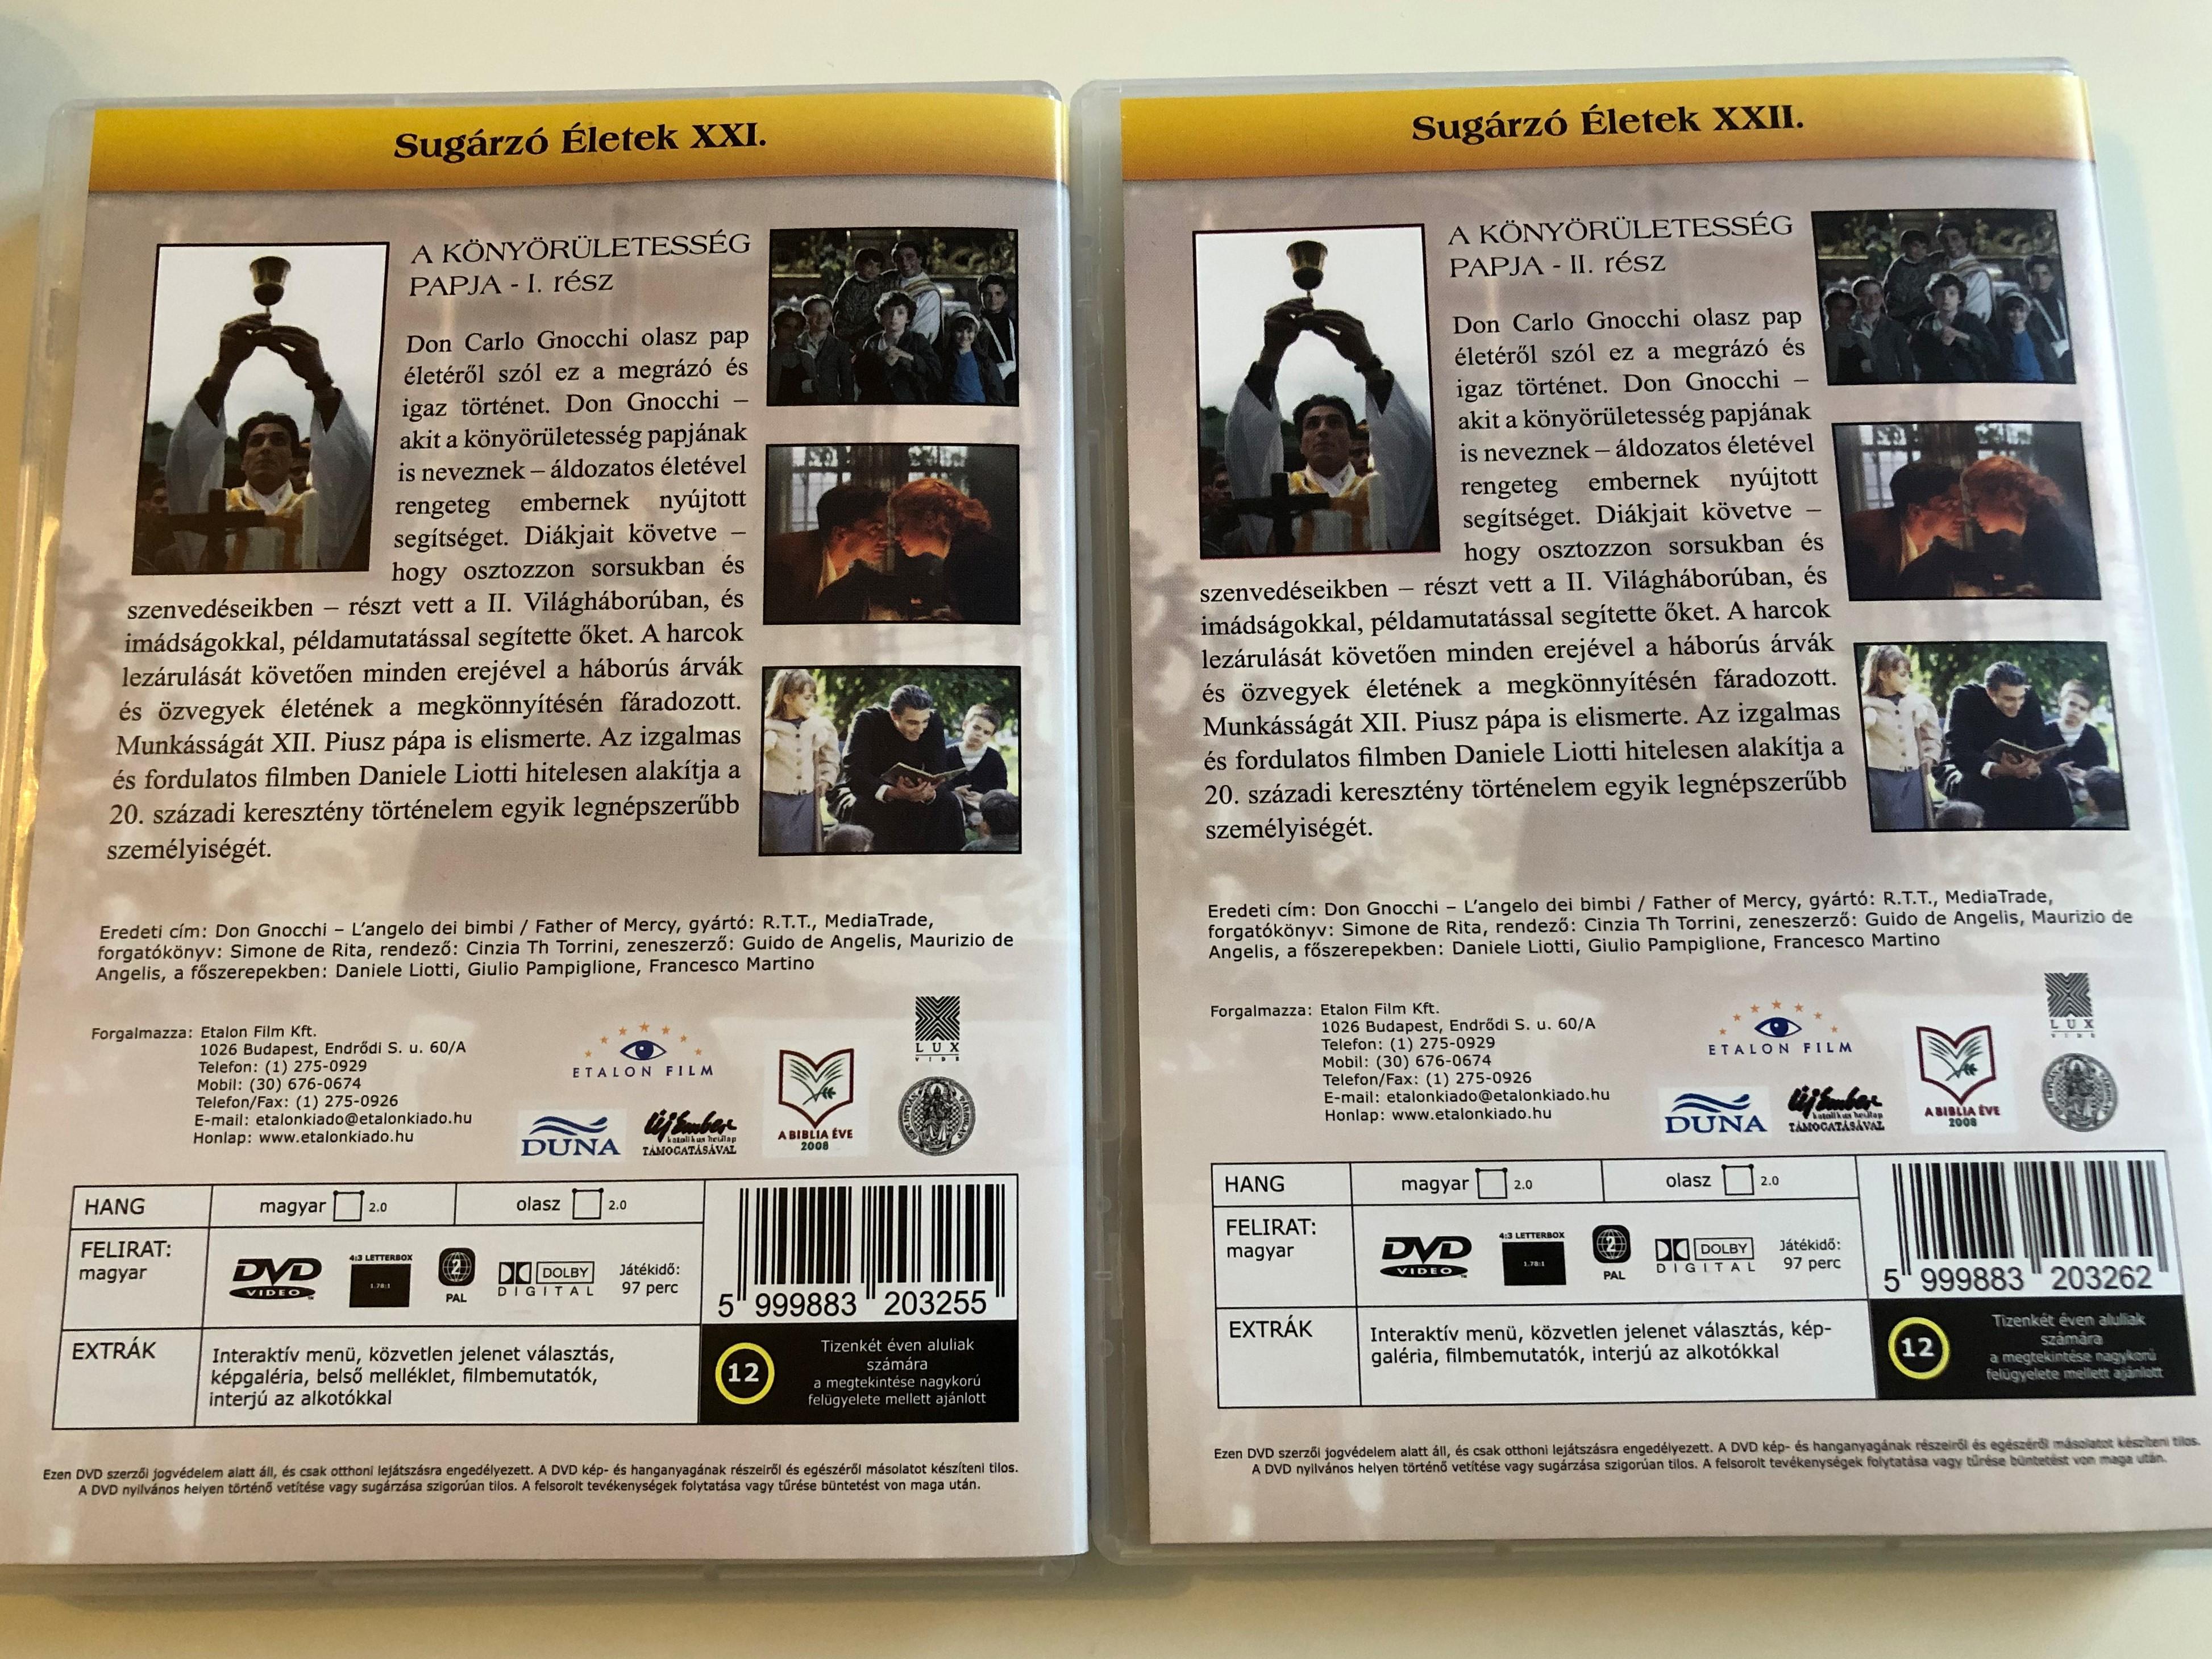 don-gnocchi-l-angelo-dei-bimbi-dvd-set-father-of-mercy-dvd-2004-a-k-ny-r-letess-g-papja-1-2-.r-sz-directed-by-cinzia-th-torrini-starring-daniele-liotti-giulio-pampiglione-francesco-martino-sug-rz-letek-xxi-xxii-.jpg